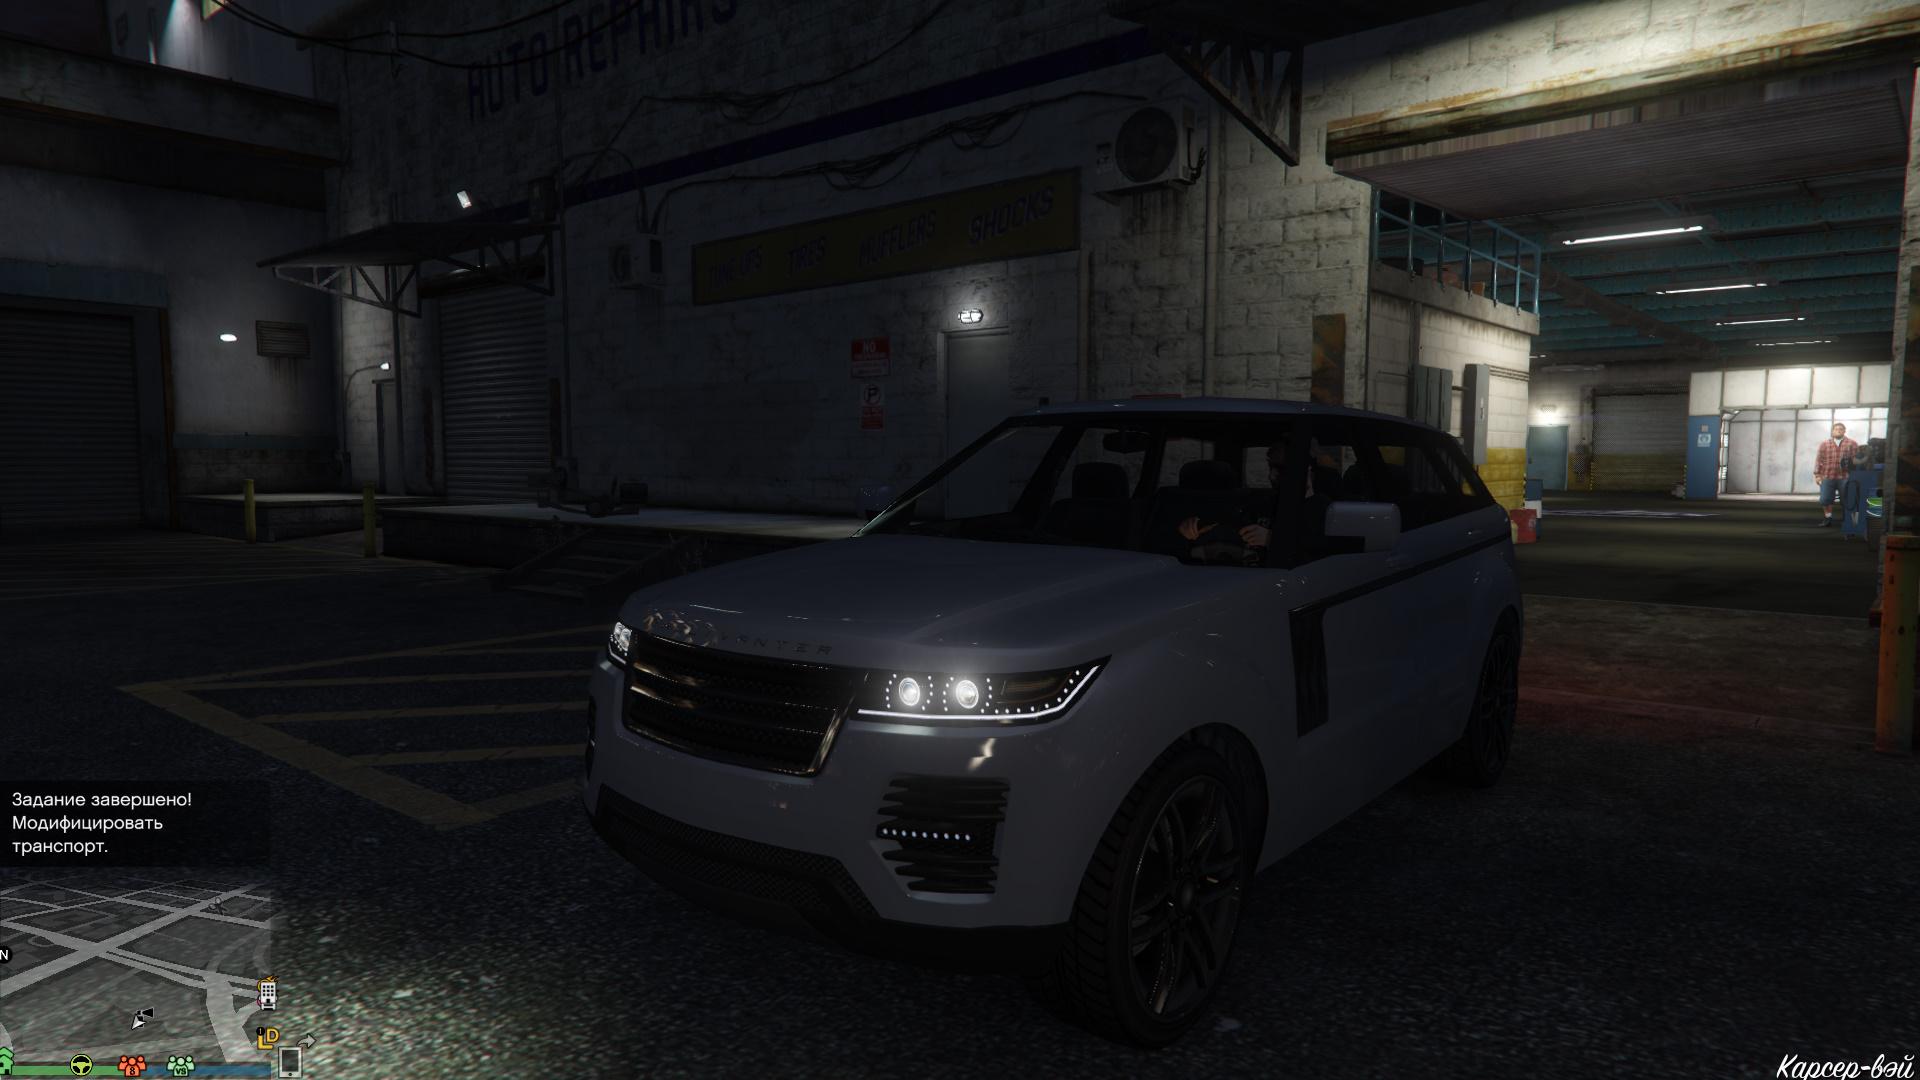 GTA5 2017-04-27 19-03-25-277.jpg - Grand Theft Auto 5